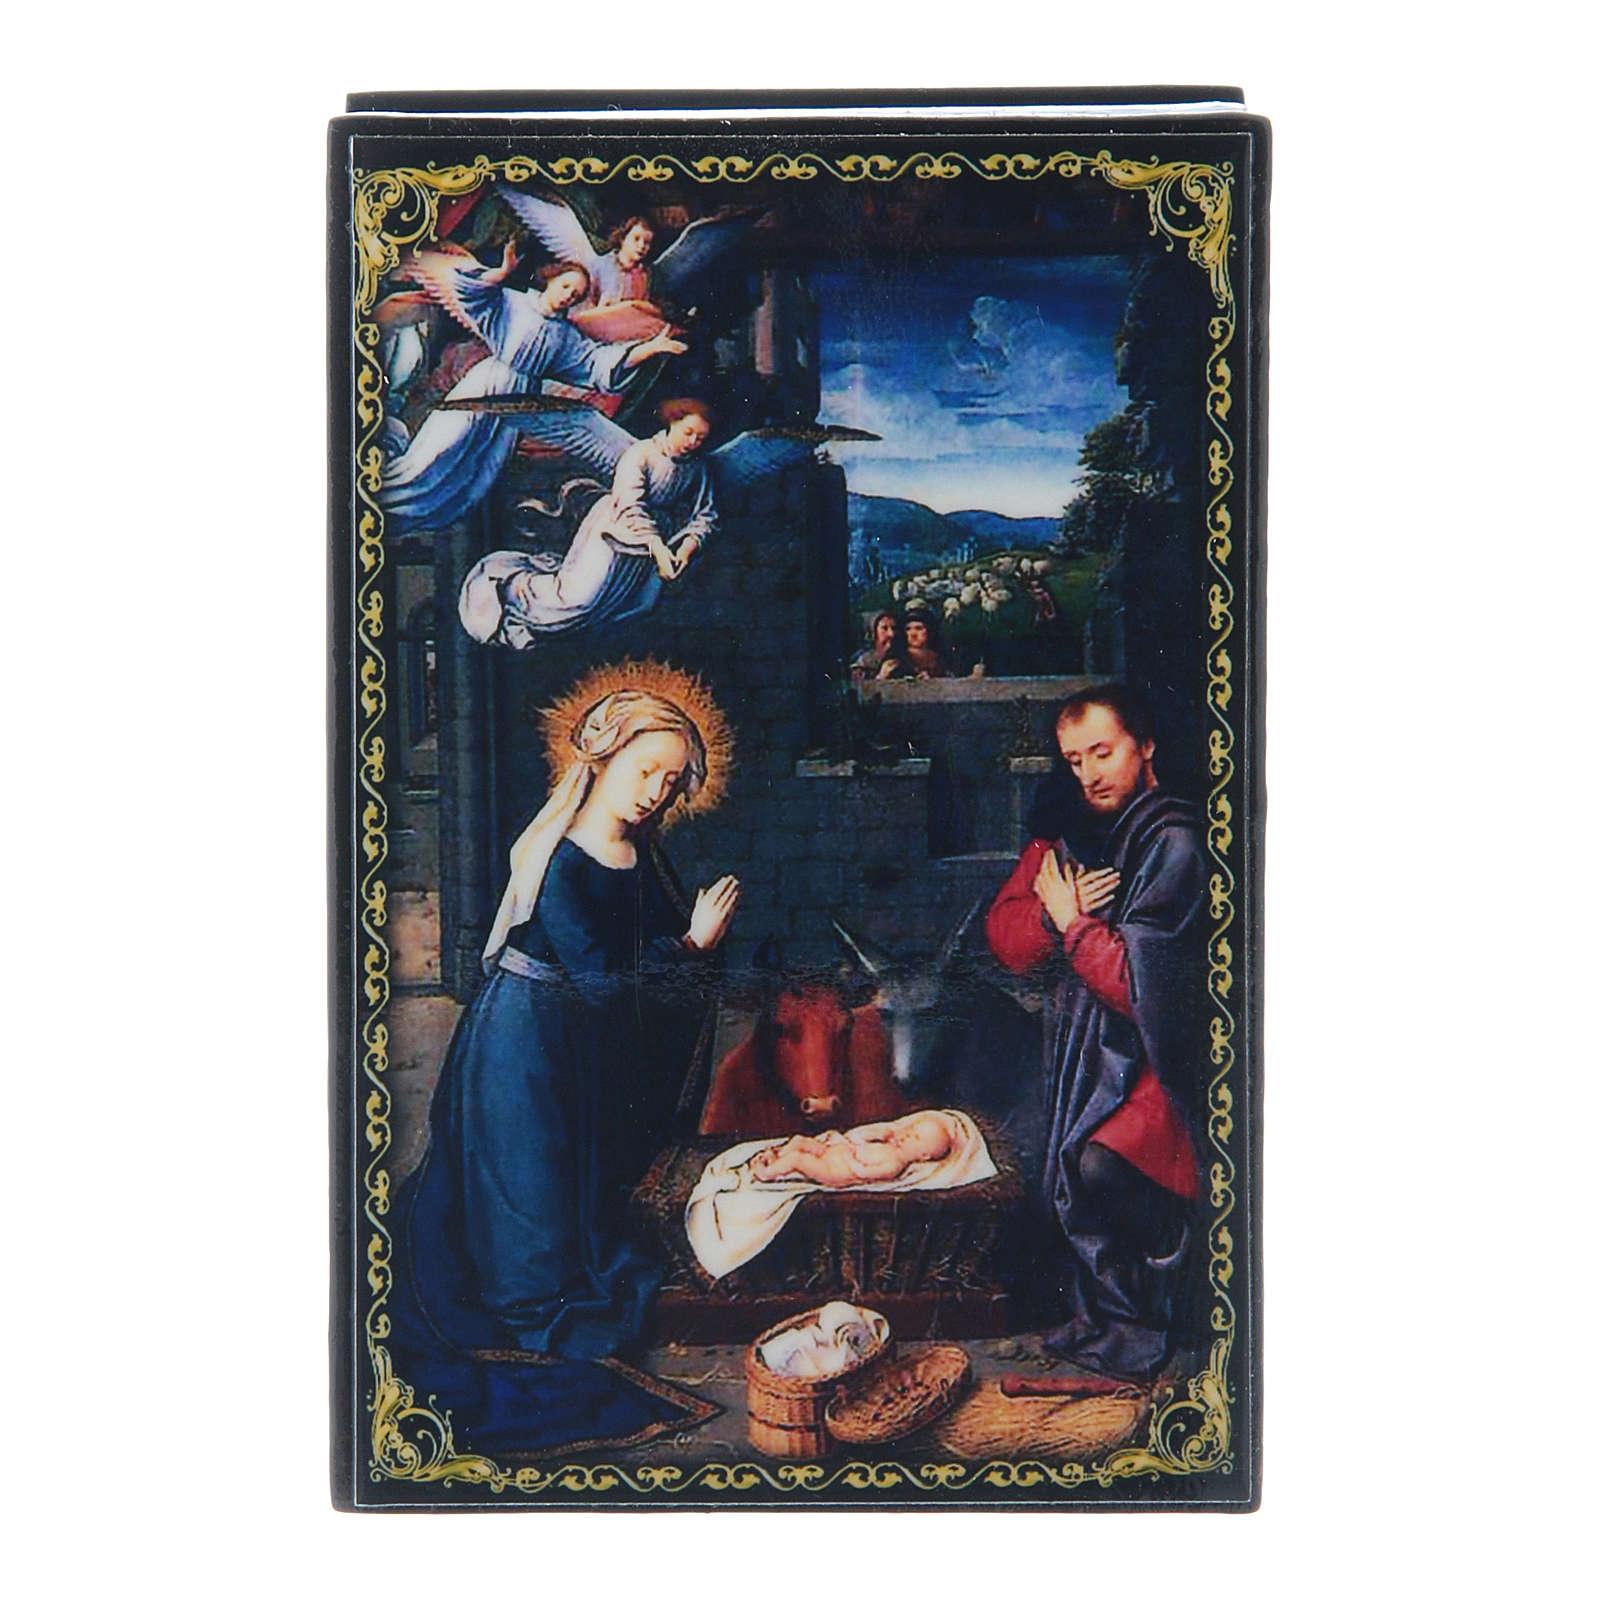 Russian enamel box, The Nativity 9x6 cm 4